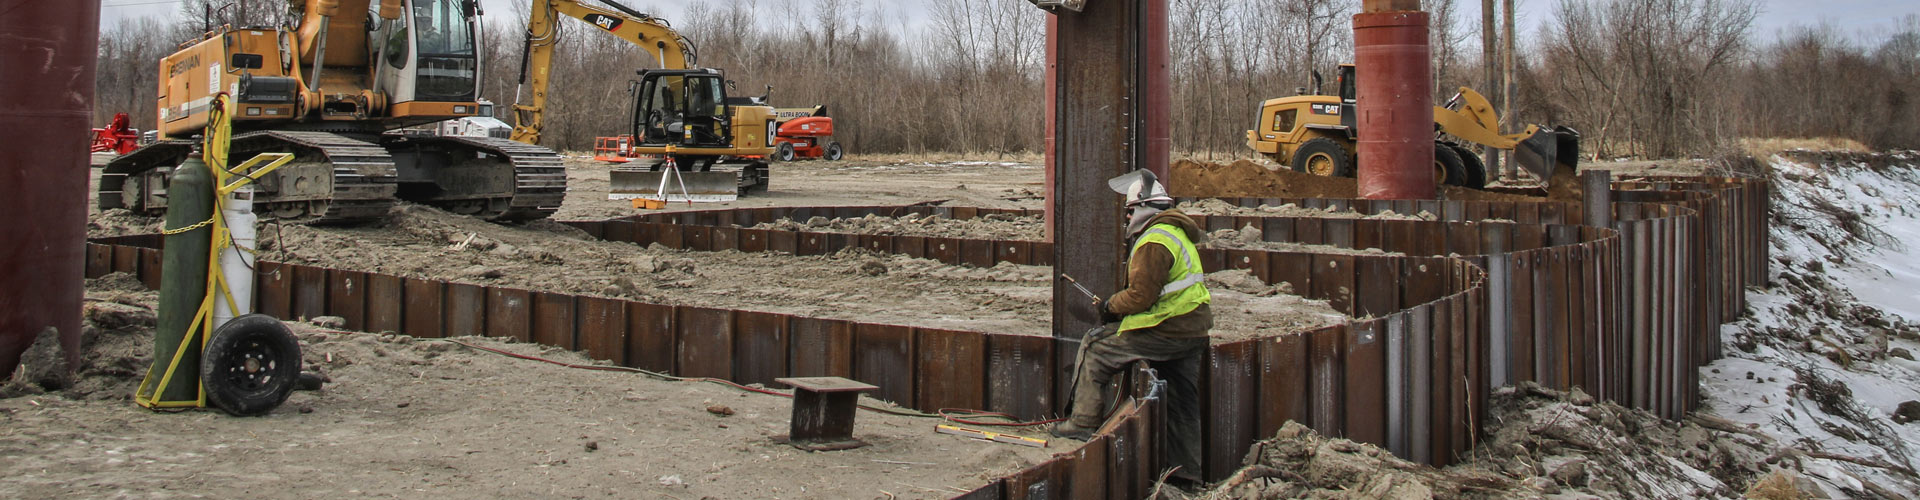 marine construction, dock construction, sheet pile walls, industrial docks, pile driving, deep foundations